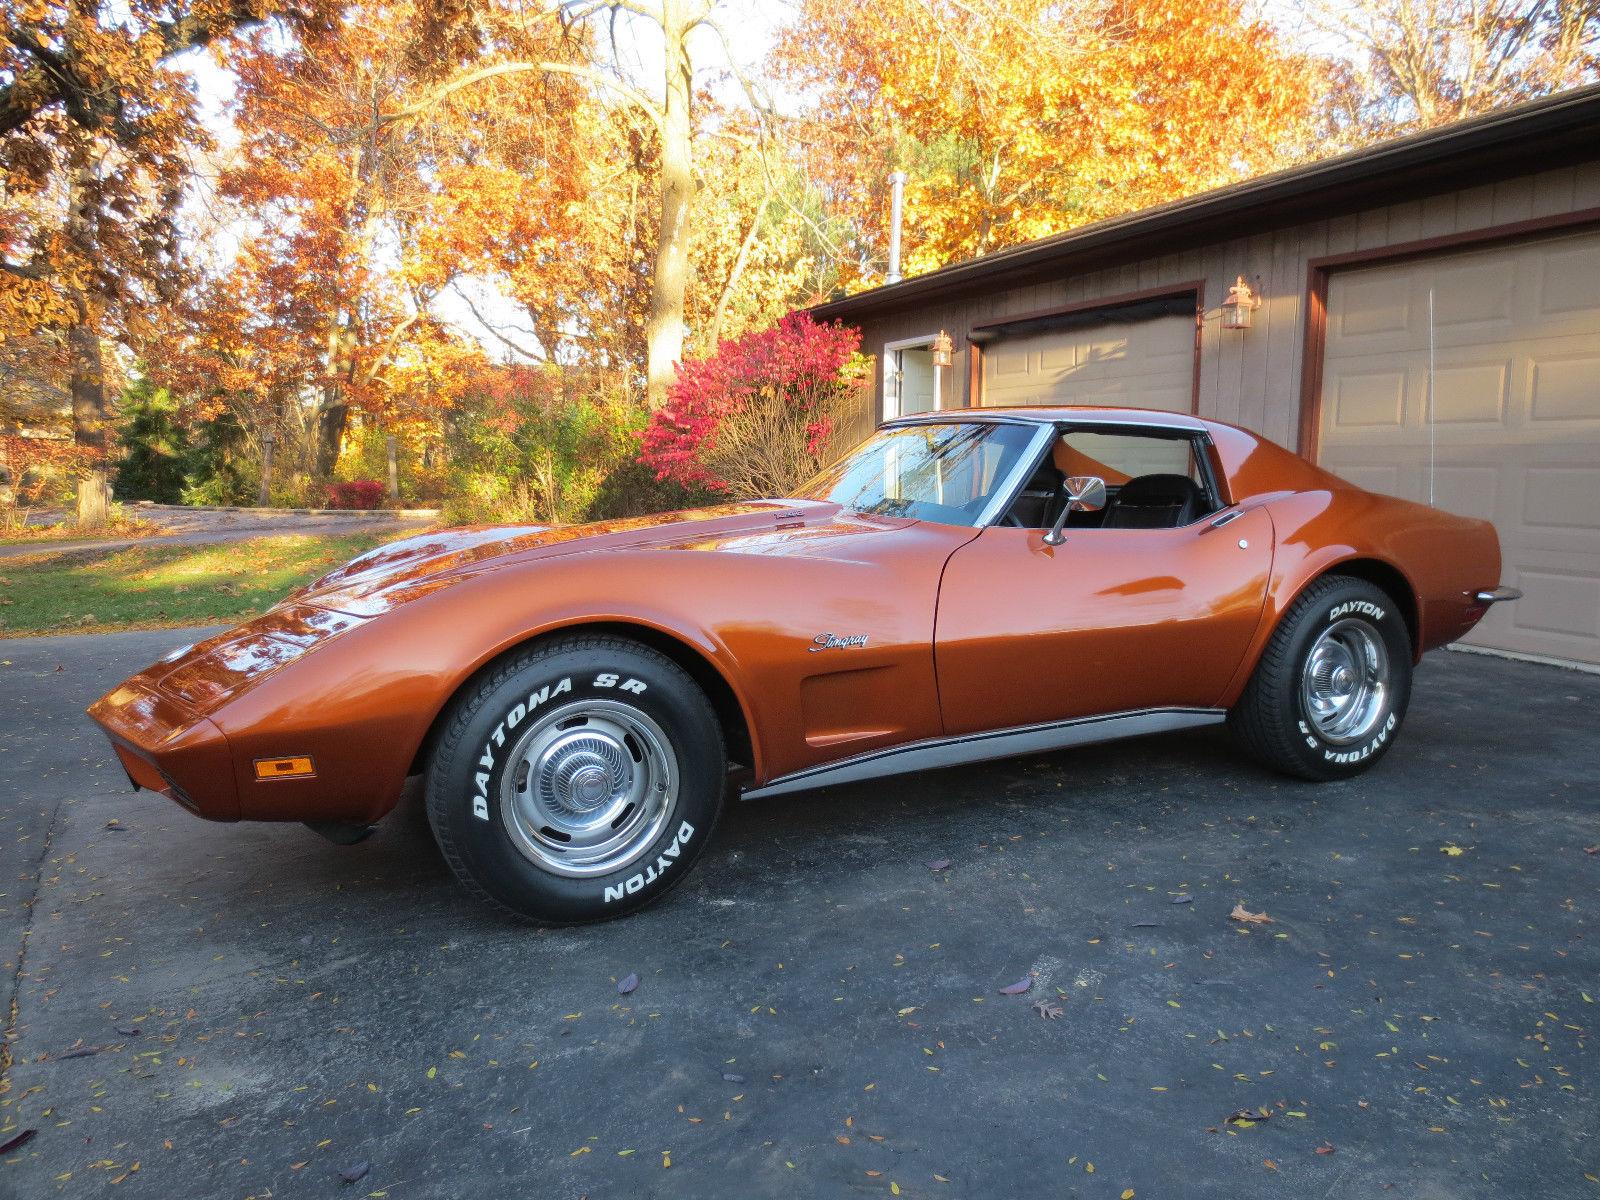 Chevrolet Corvette T Top L Speed Atomic Orange Beaustiful Car